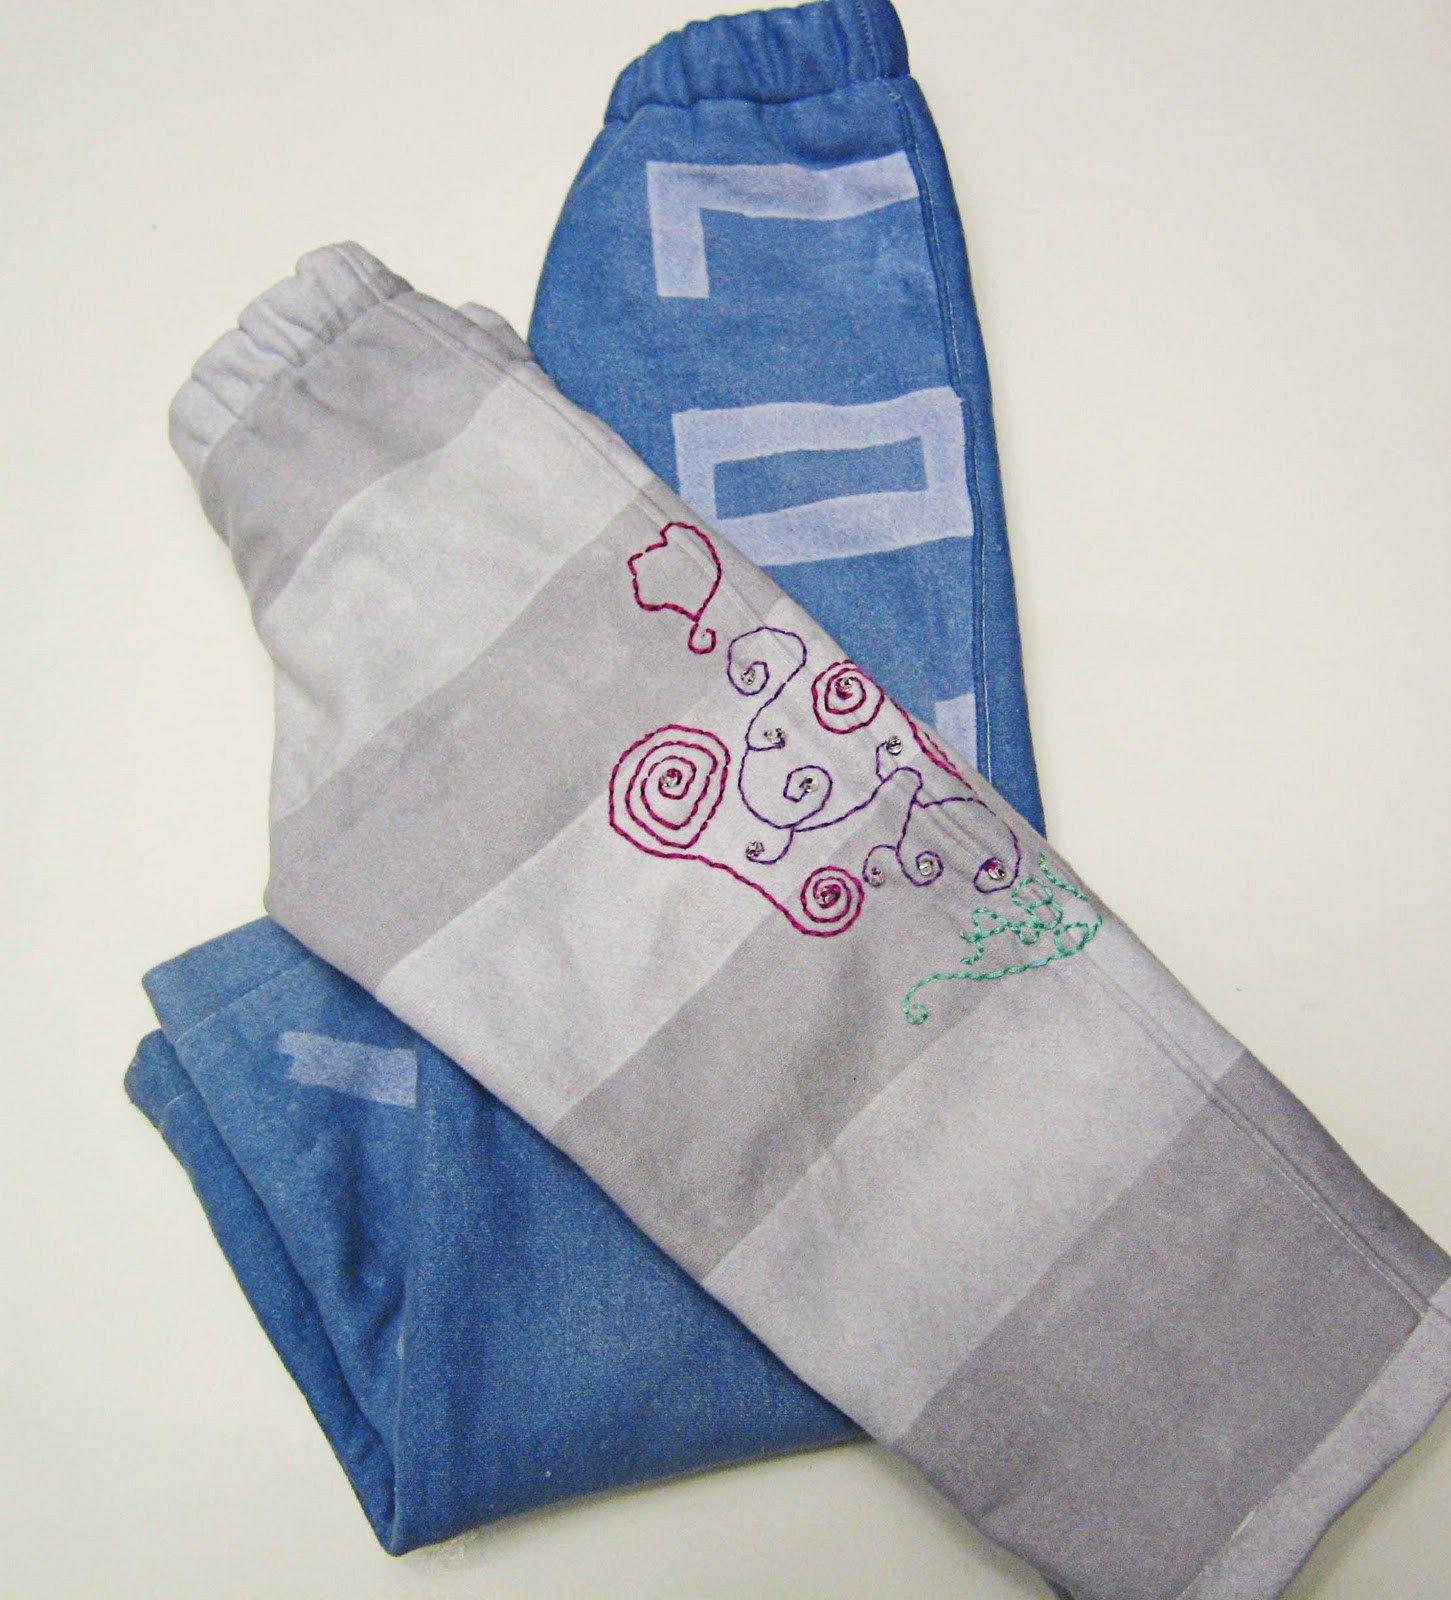 DIY Fabric Prints | Printing on fabric, How to dye fabric ...